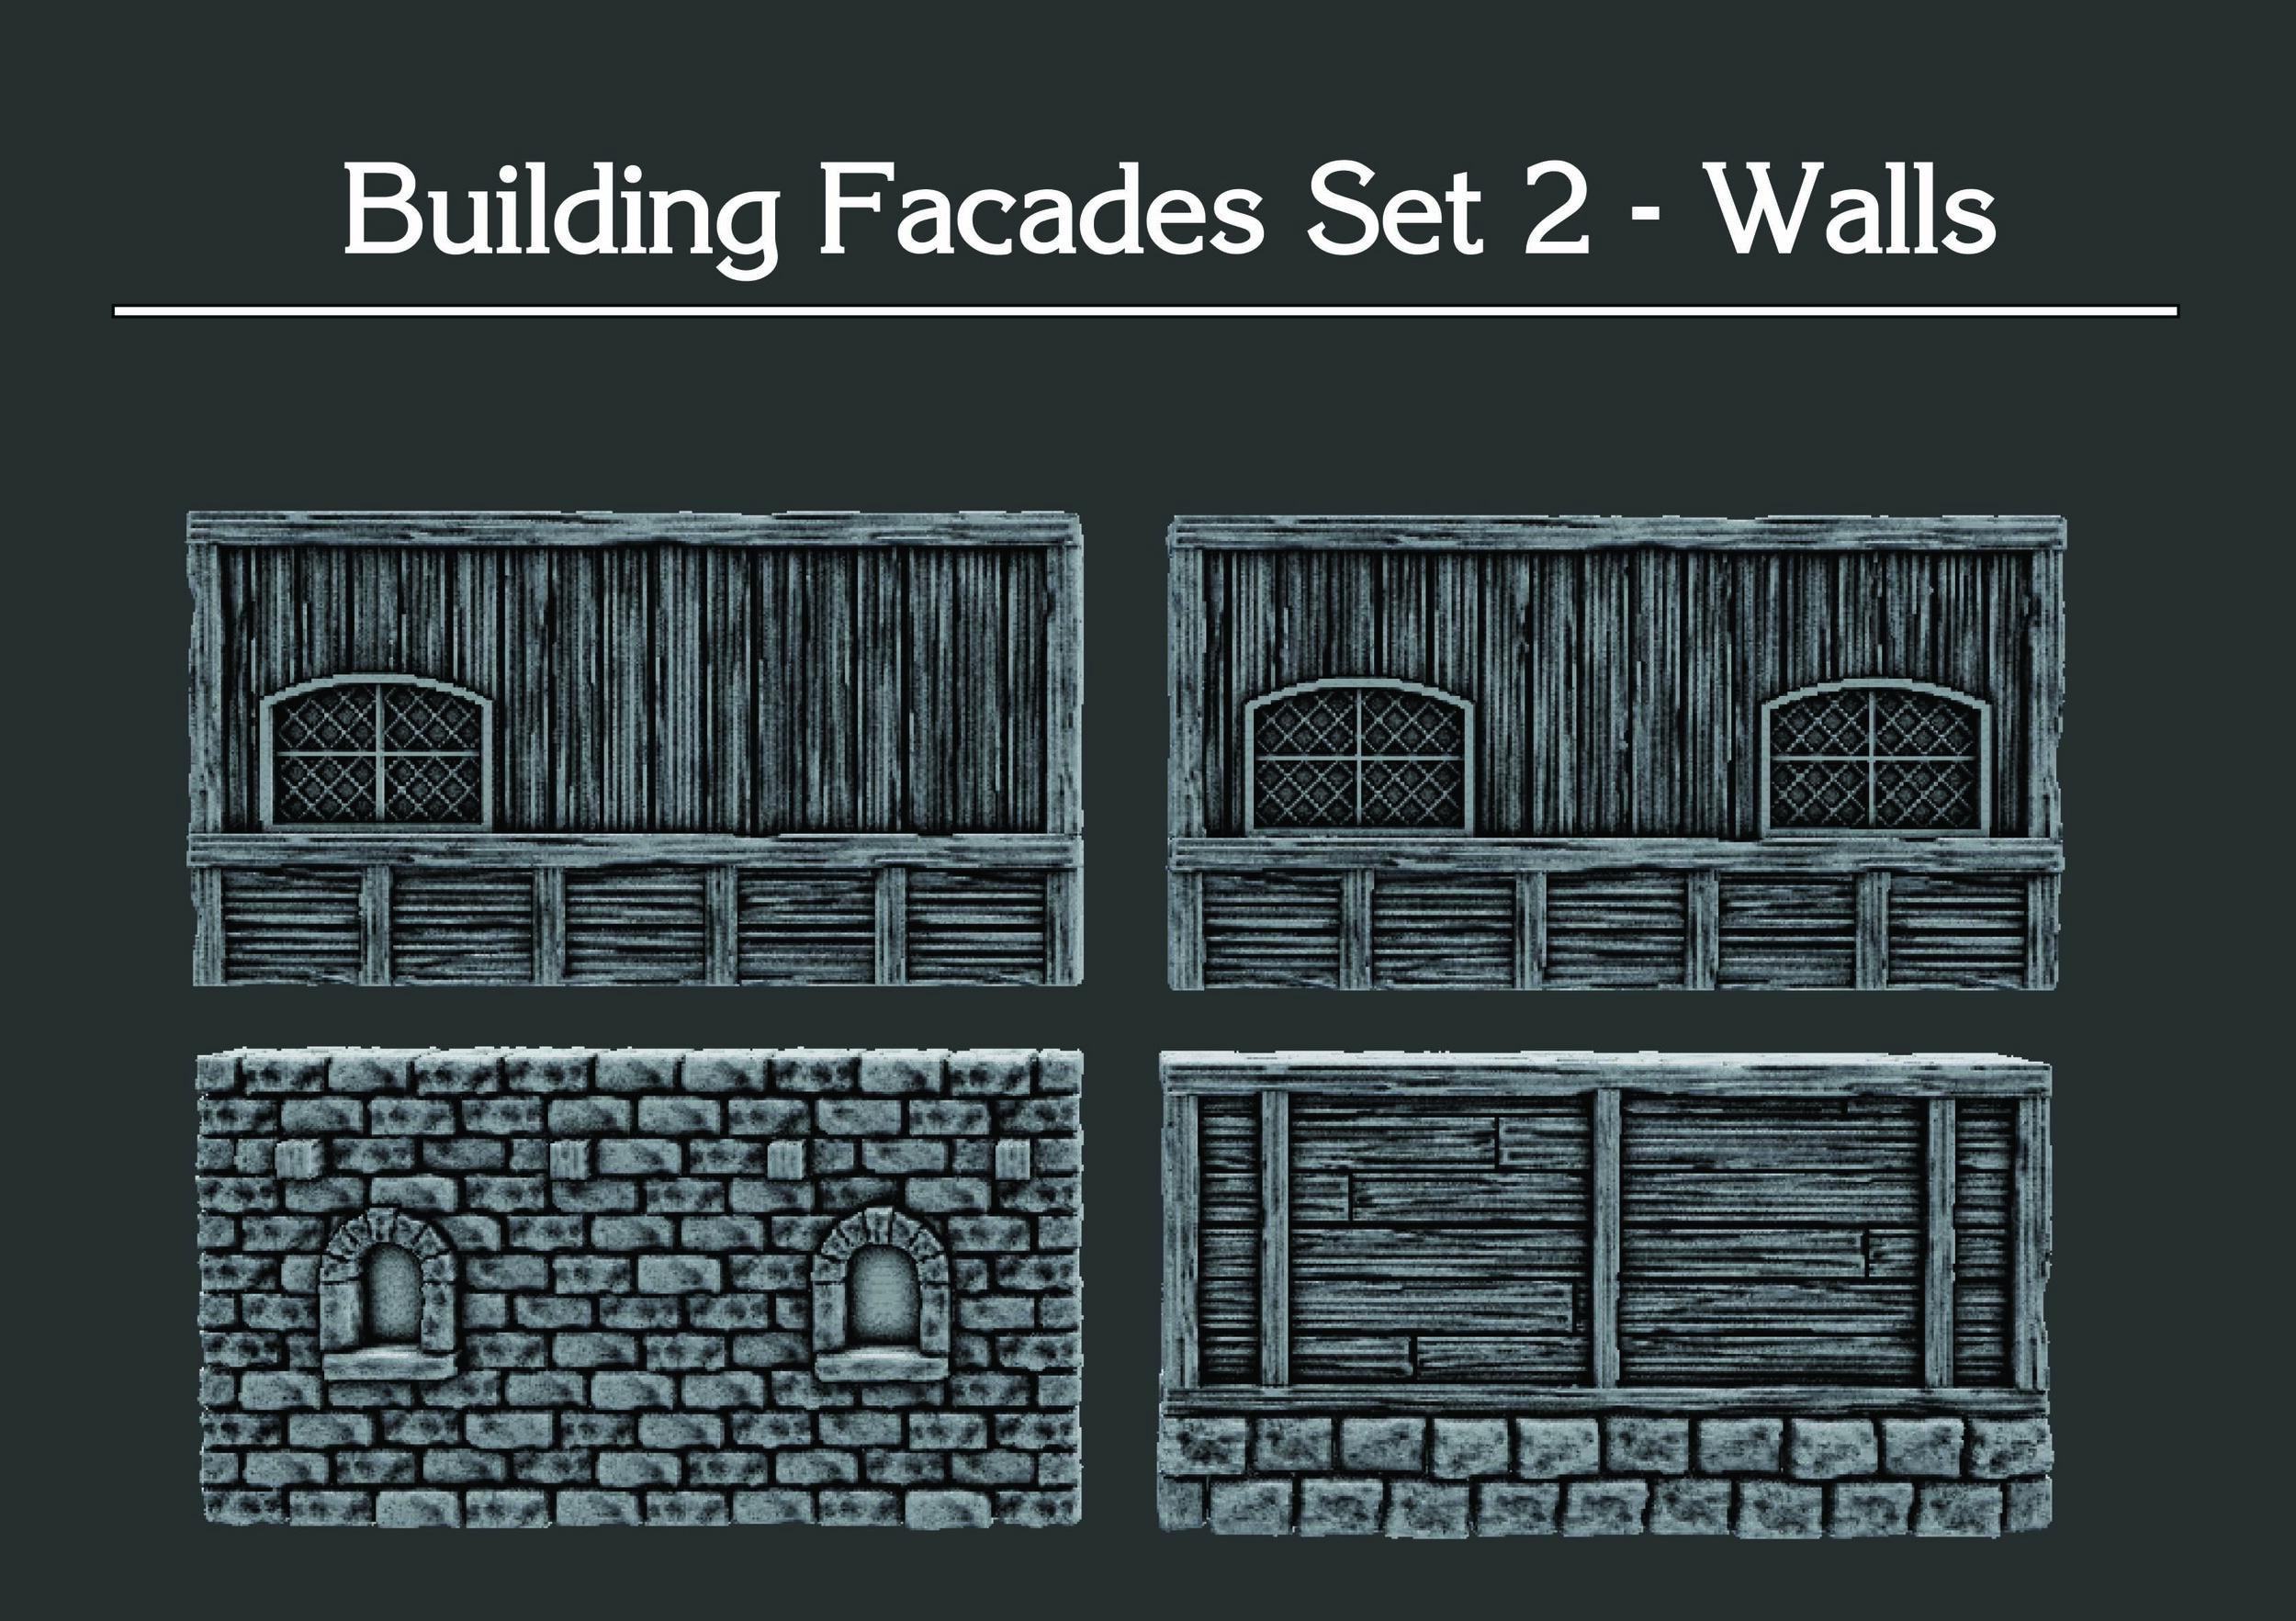 Building Facades Set 2 Walls 1.2.jpg